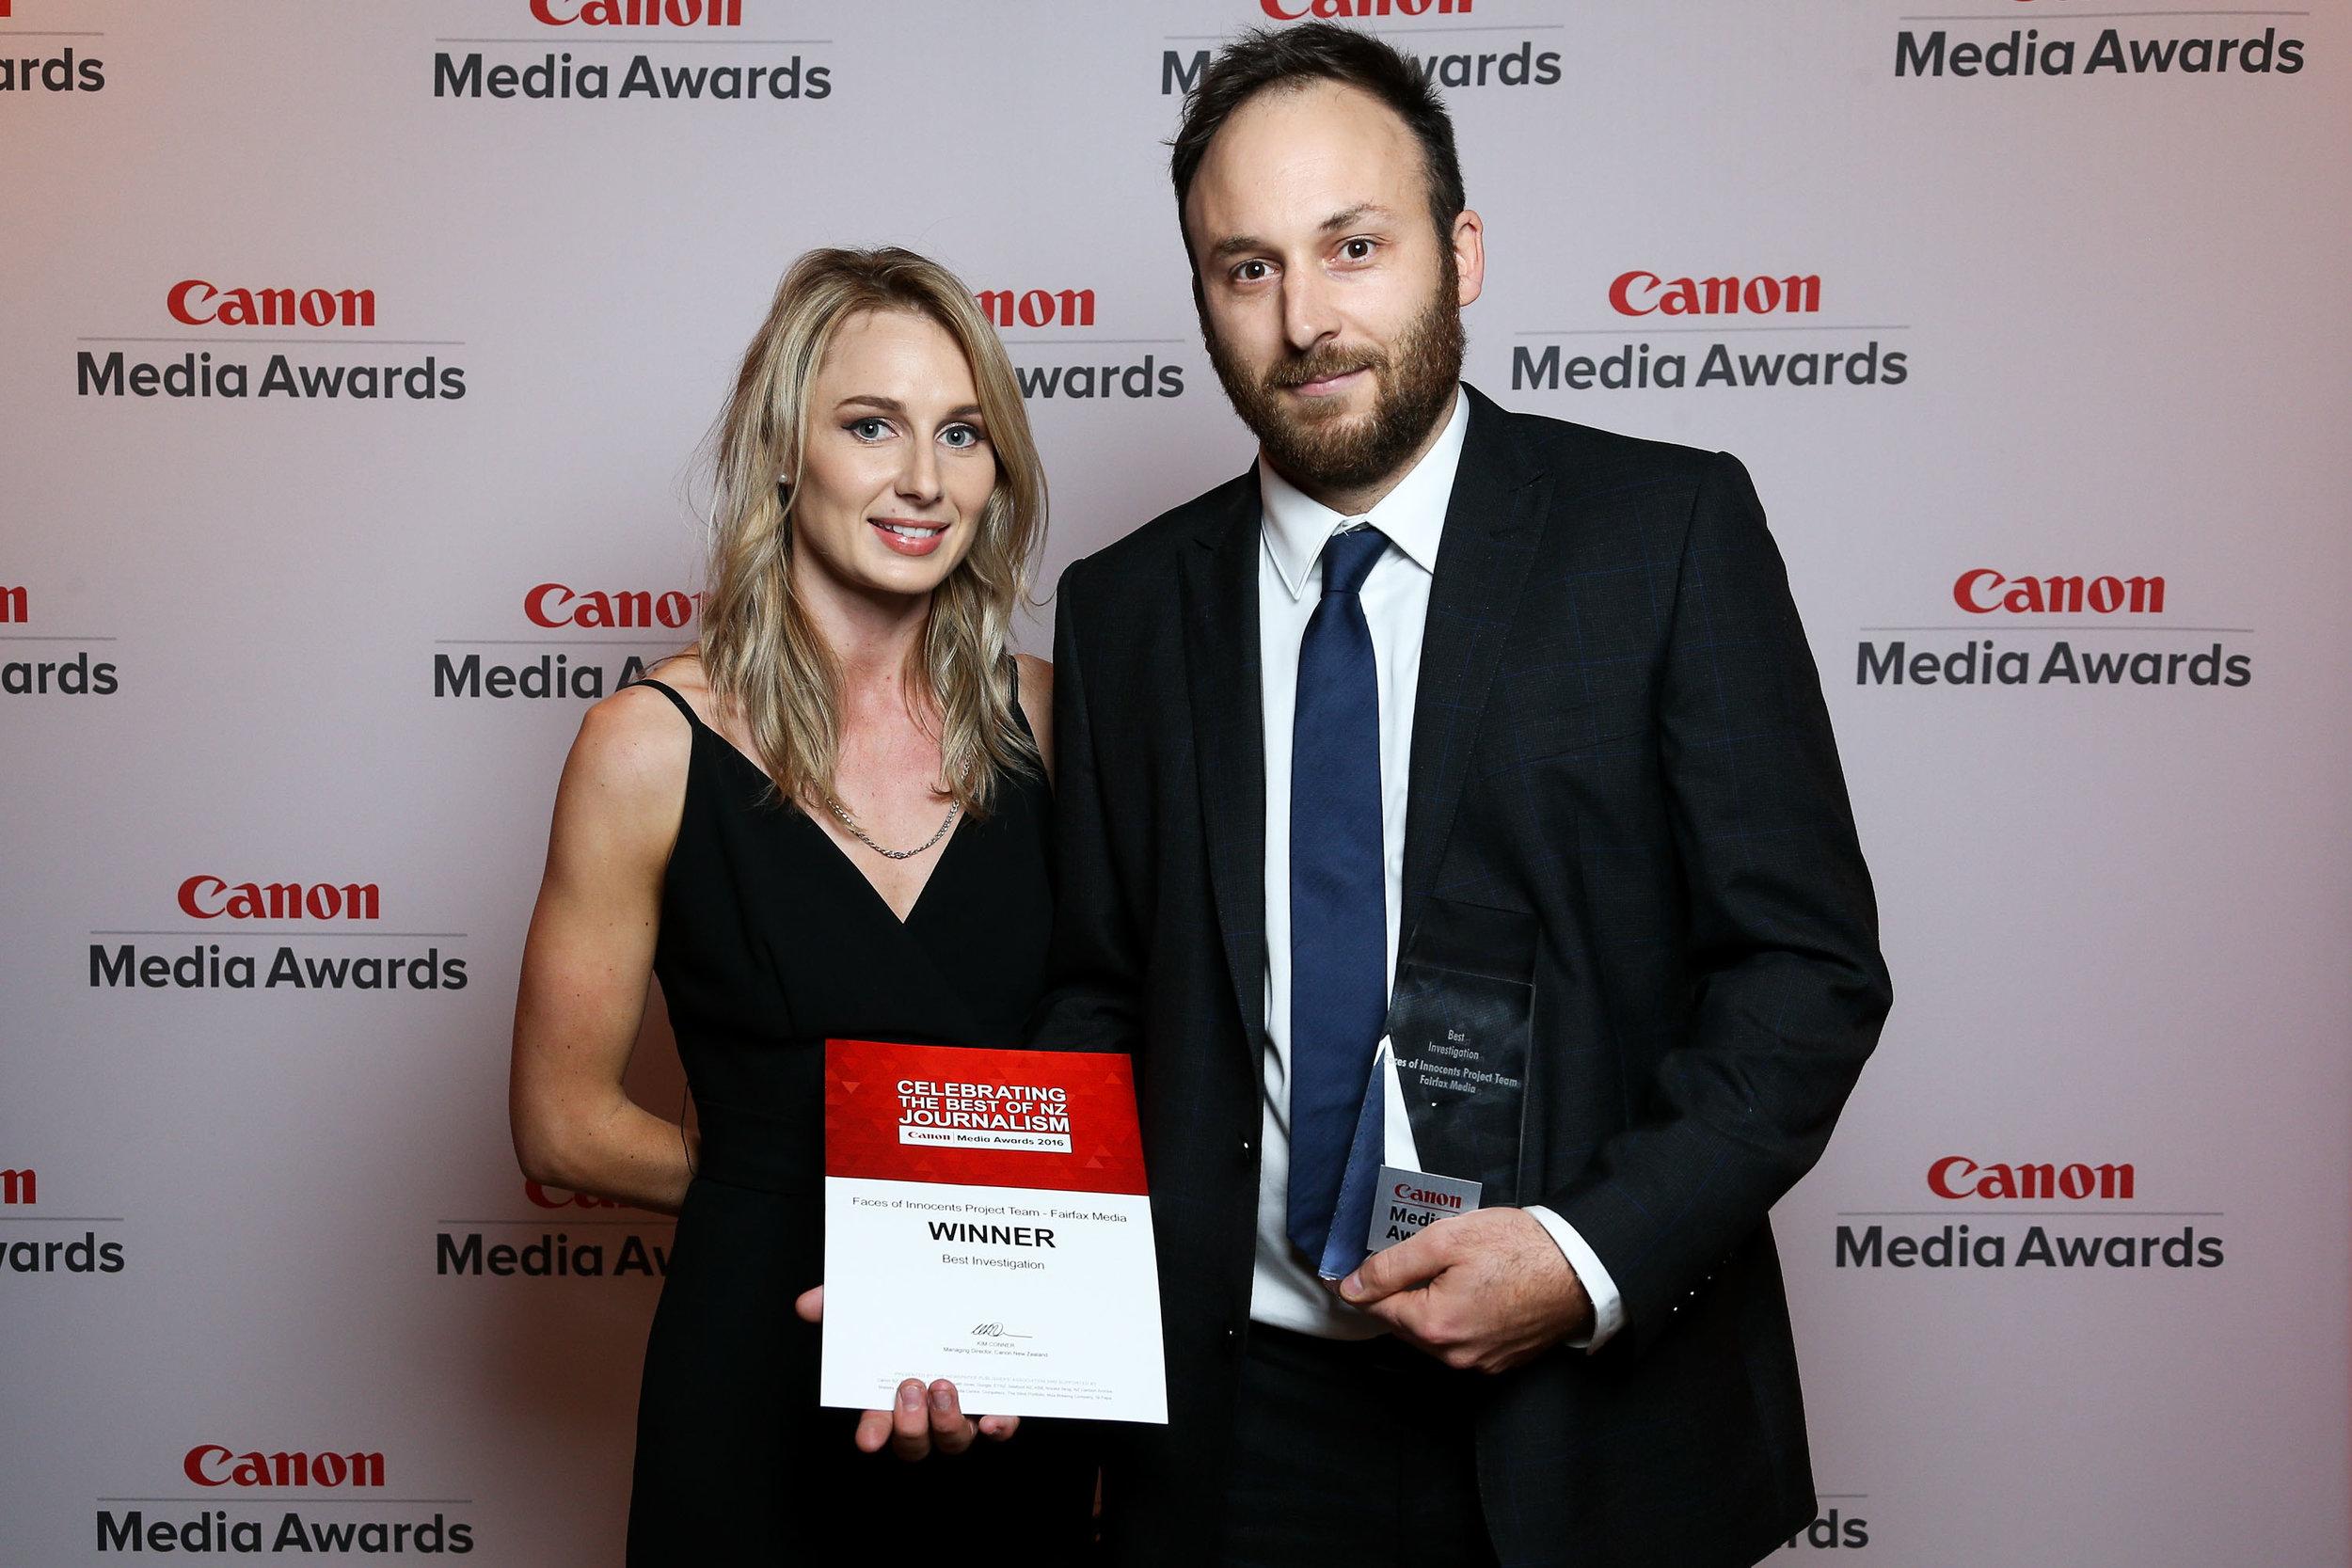 160520_Canon_Media_Awards_10.JPG